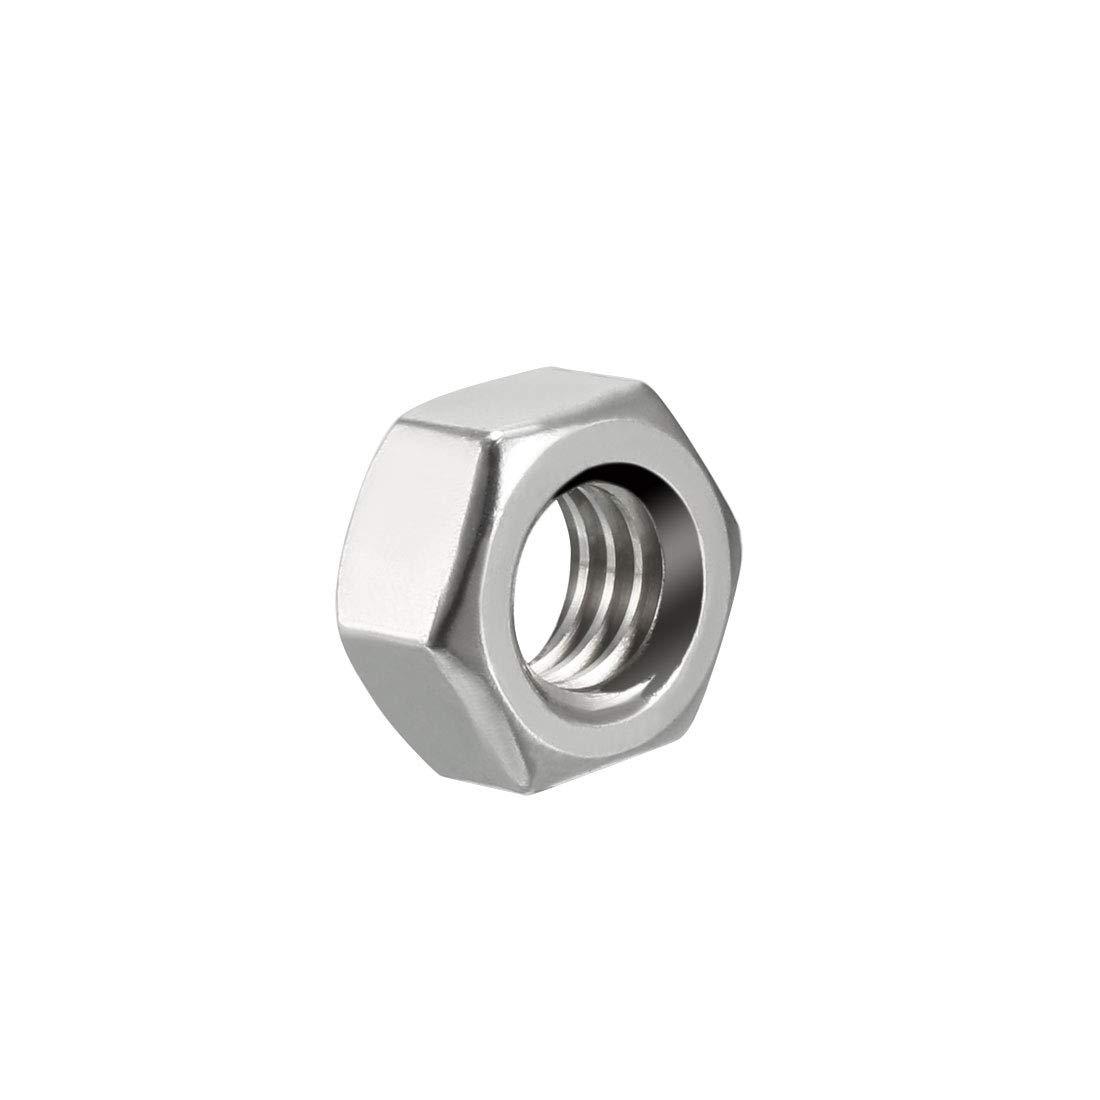 sourcing map 7//16-14 Tuerca hexagonal de 304 acero inoxidable tono Plata 10pcs